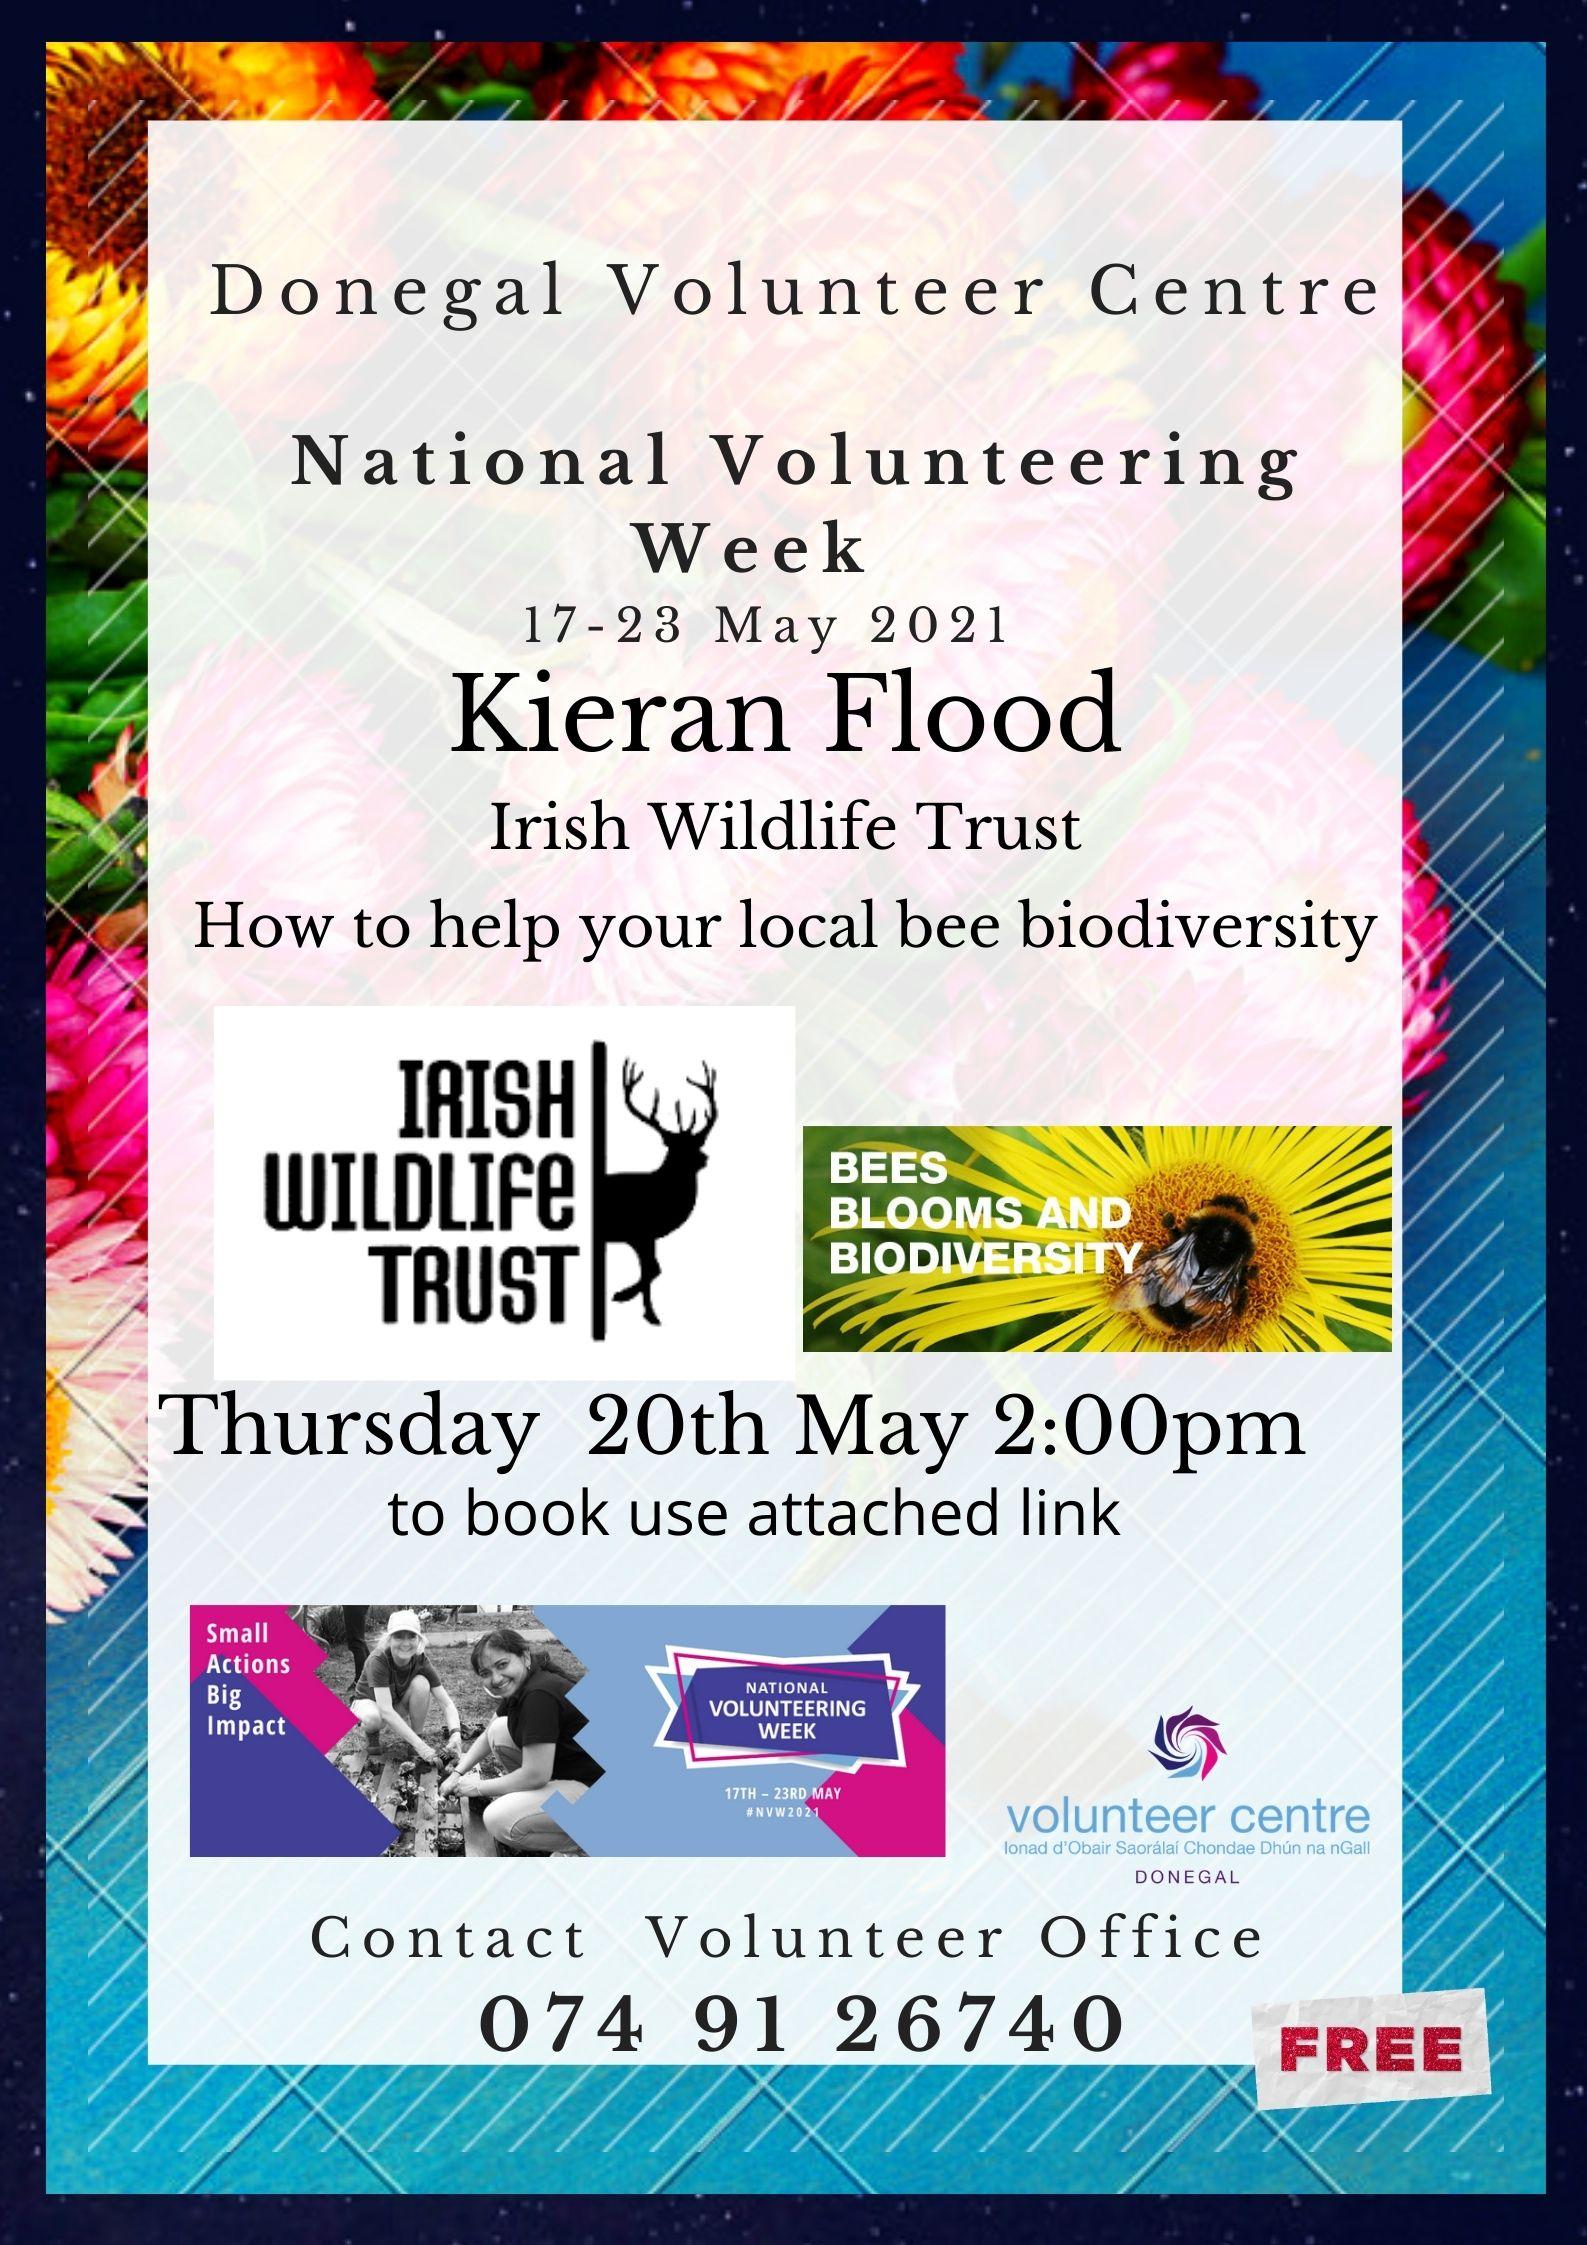 National Volunteer Week 2021 - Donegal Free Events Guide ...